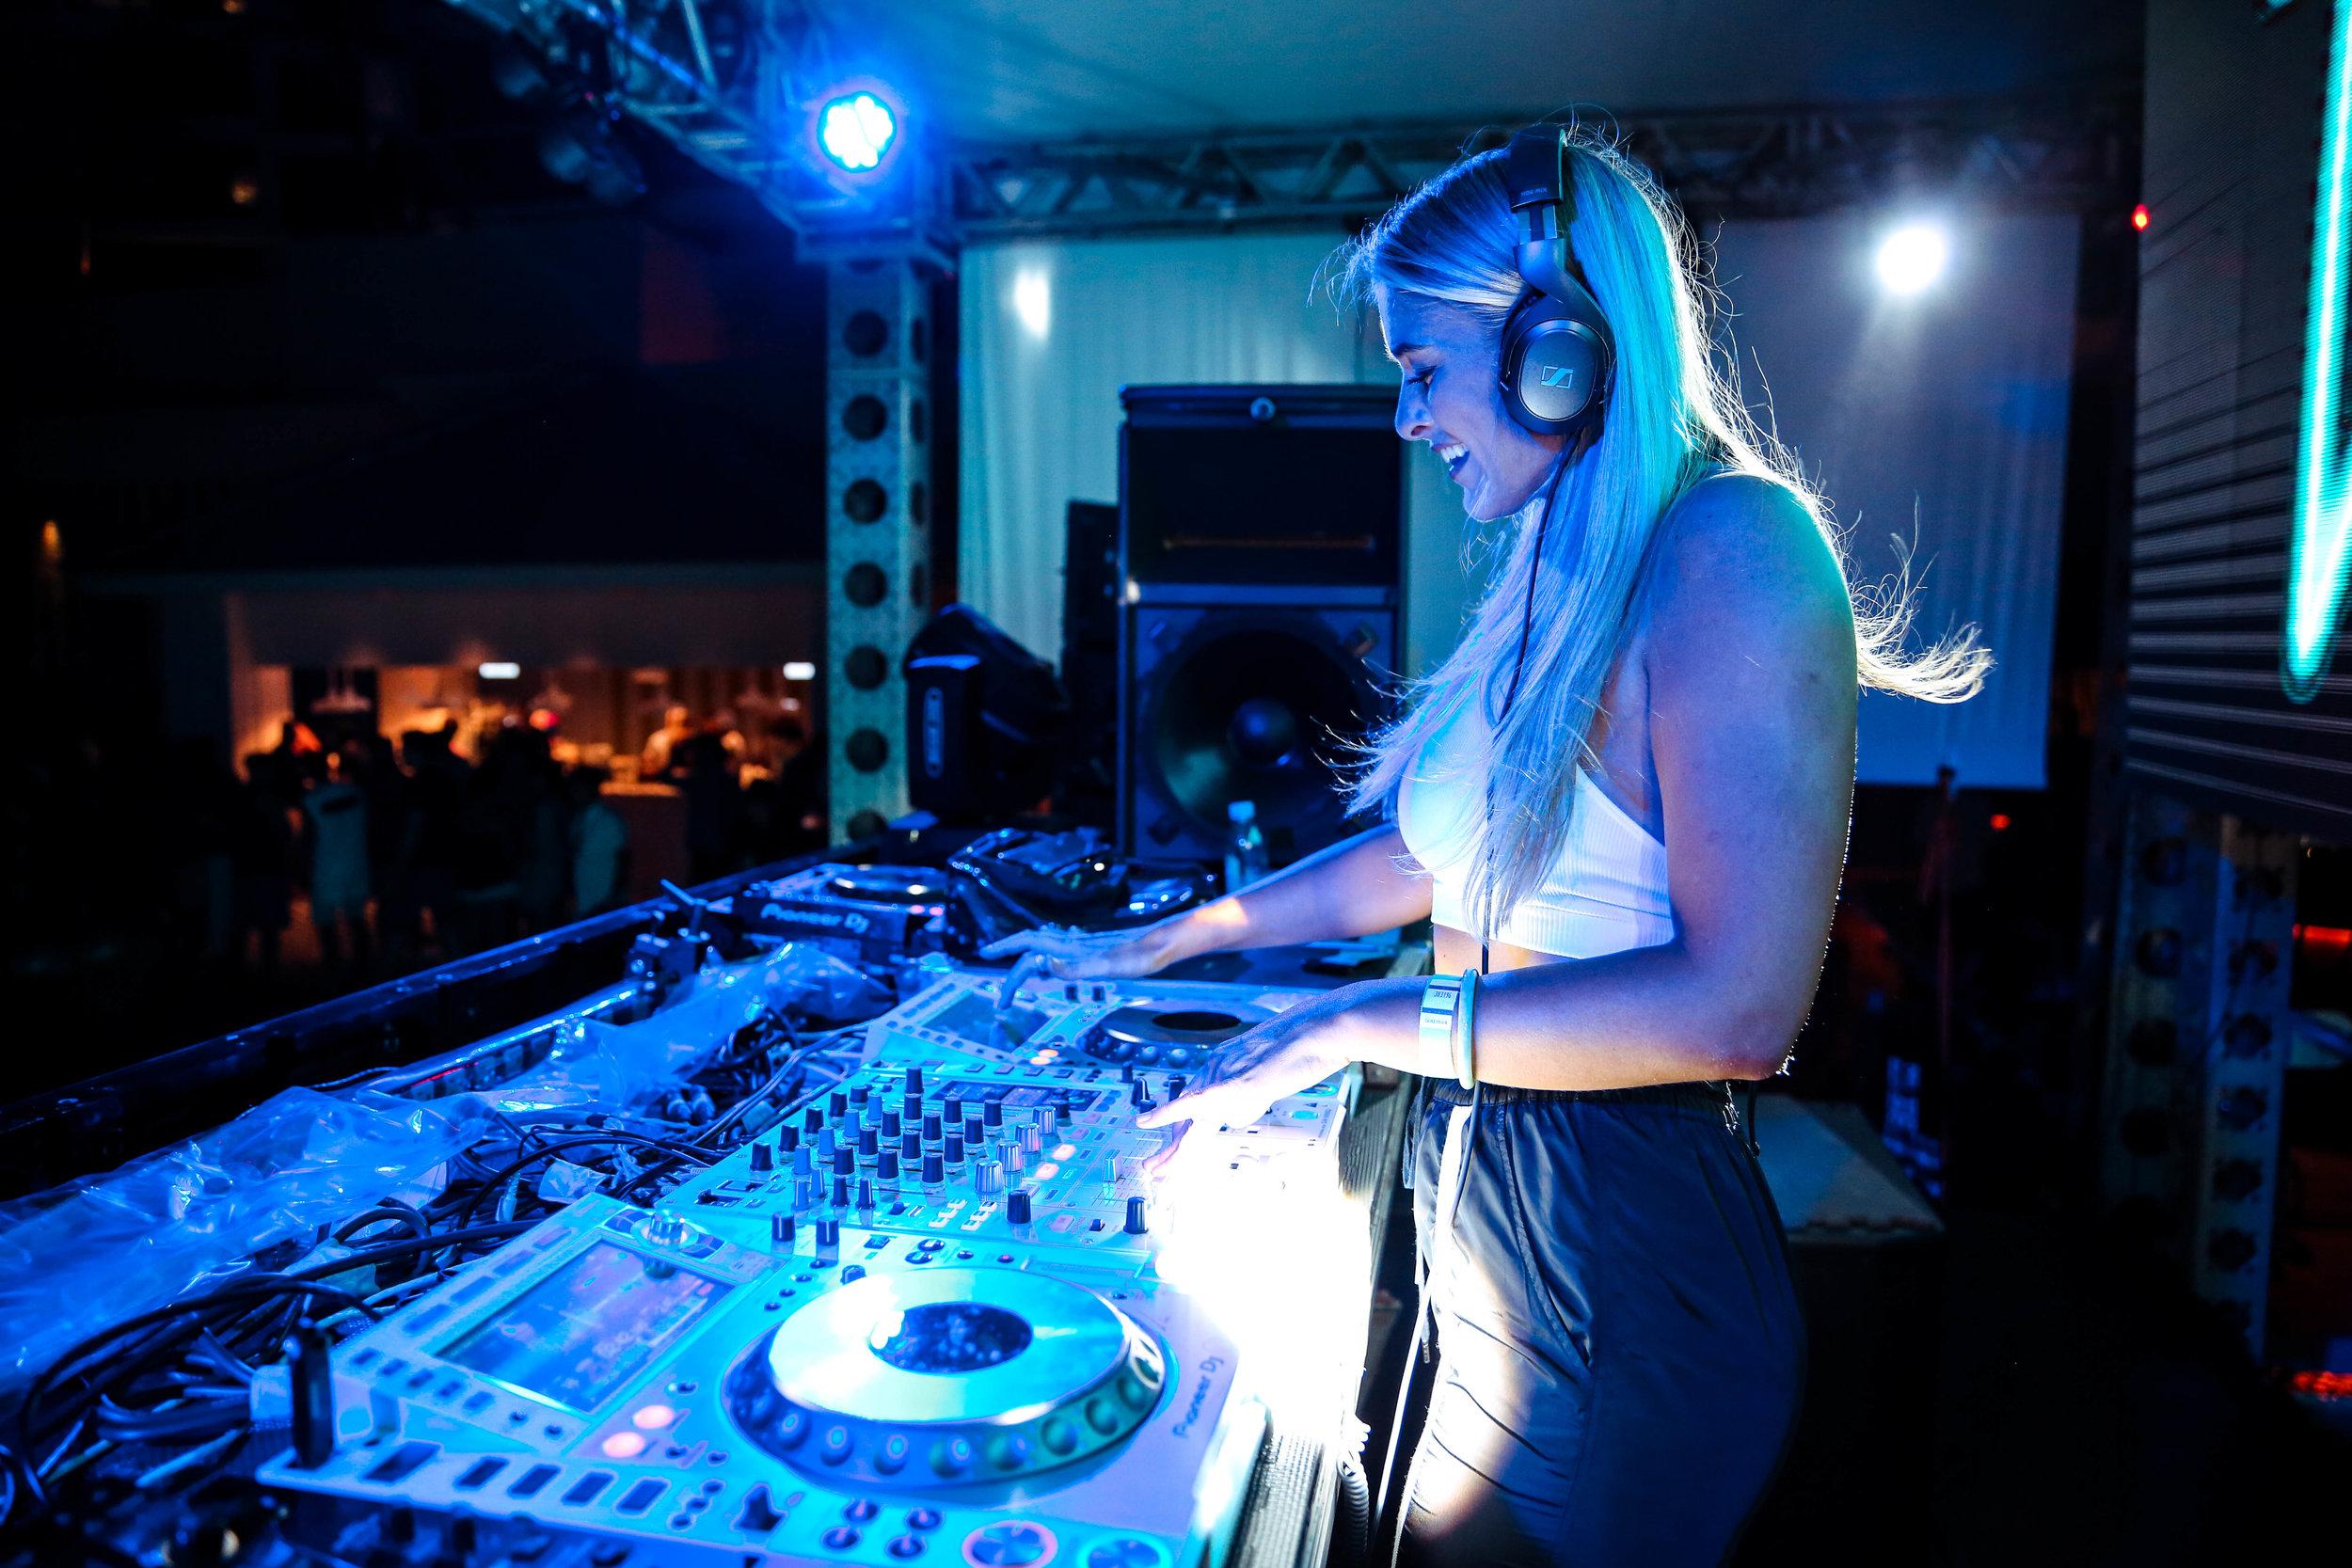 9 - TDade SLS Brickell Miami FL Tricia Dade DJ T.Dade-0665 copy 2.jpg